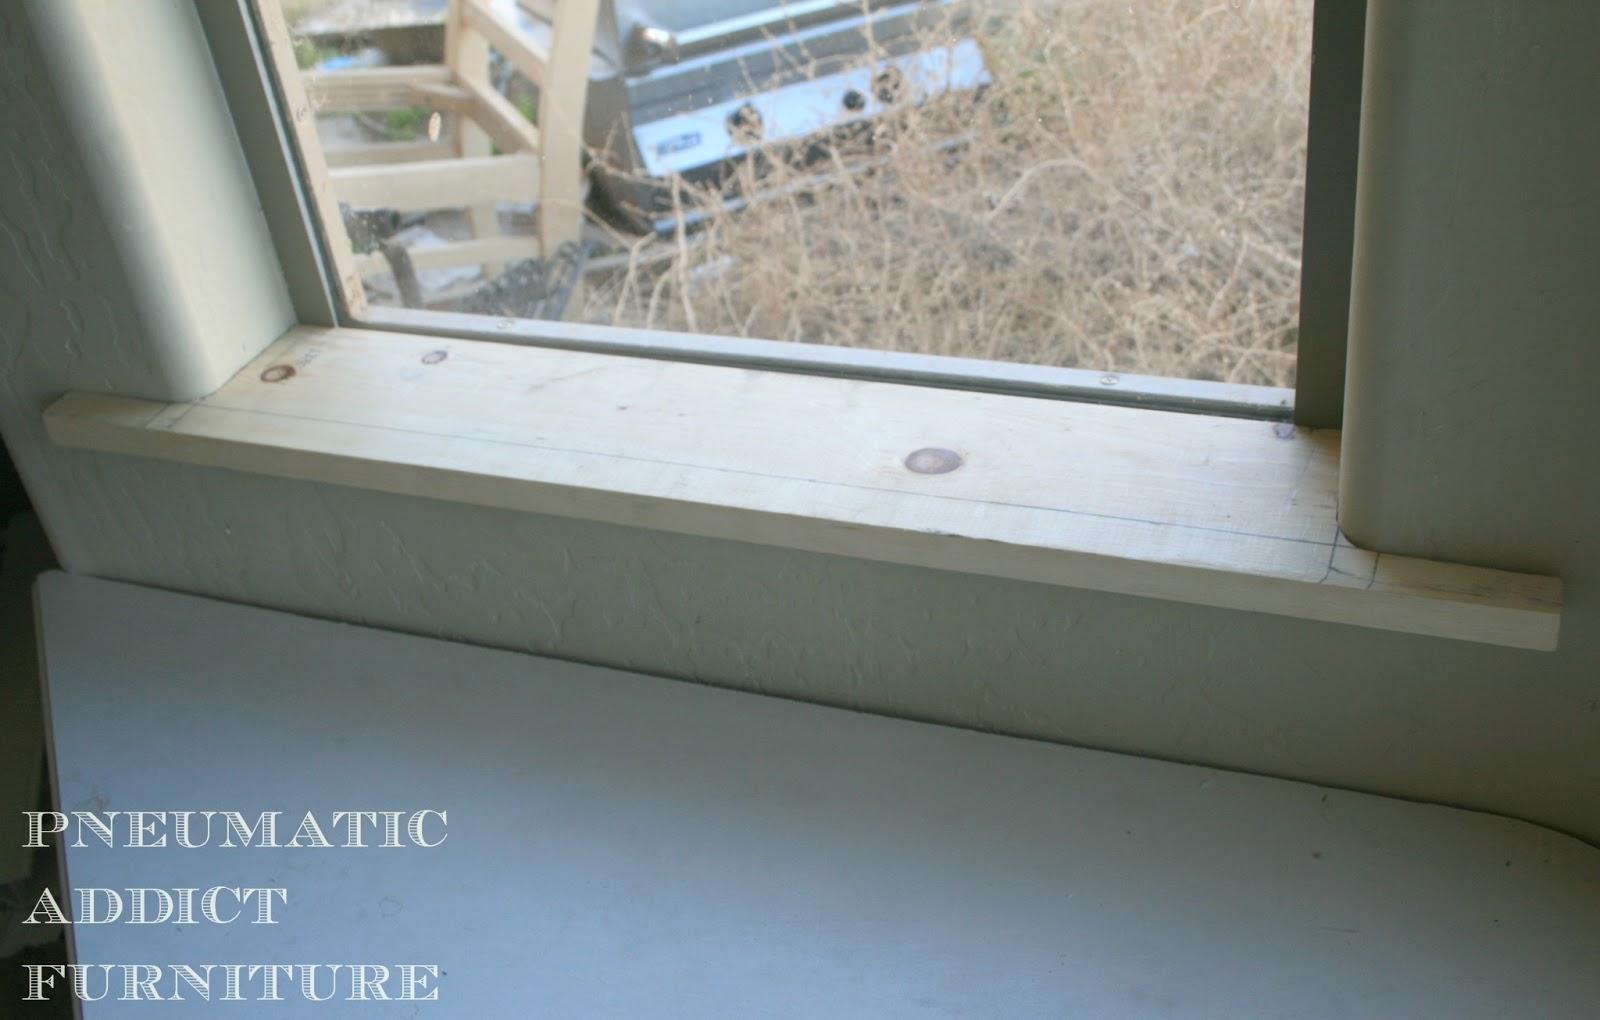 Putting On Eyeliner Diy Window Trim Pneumatic Addict